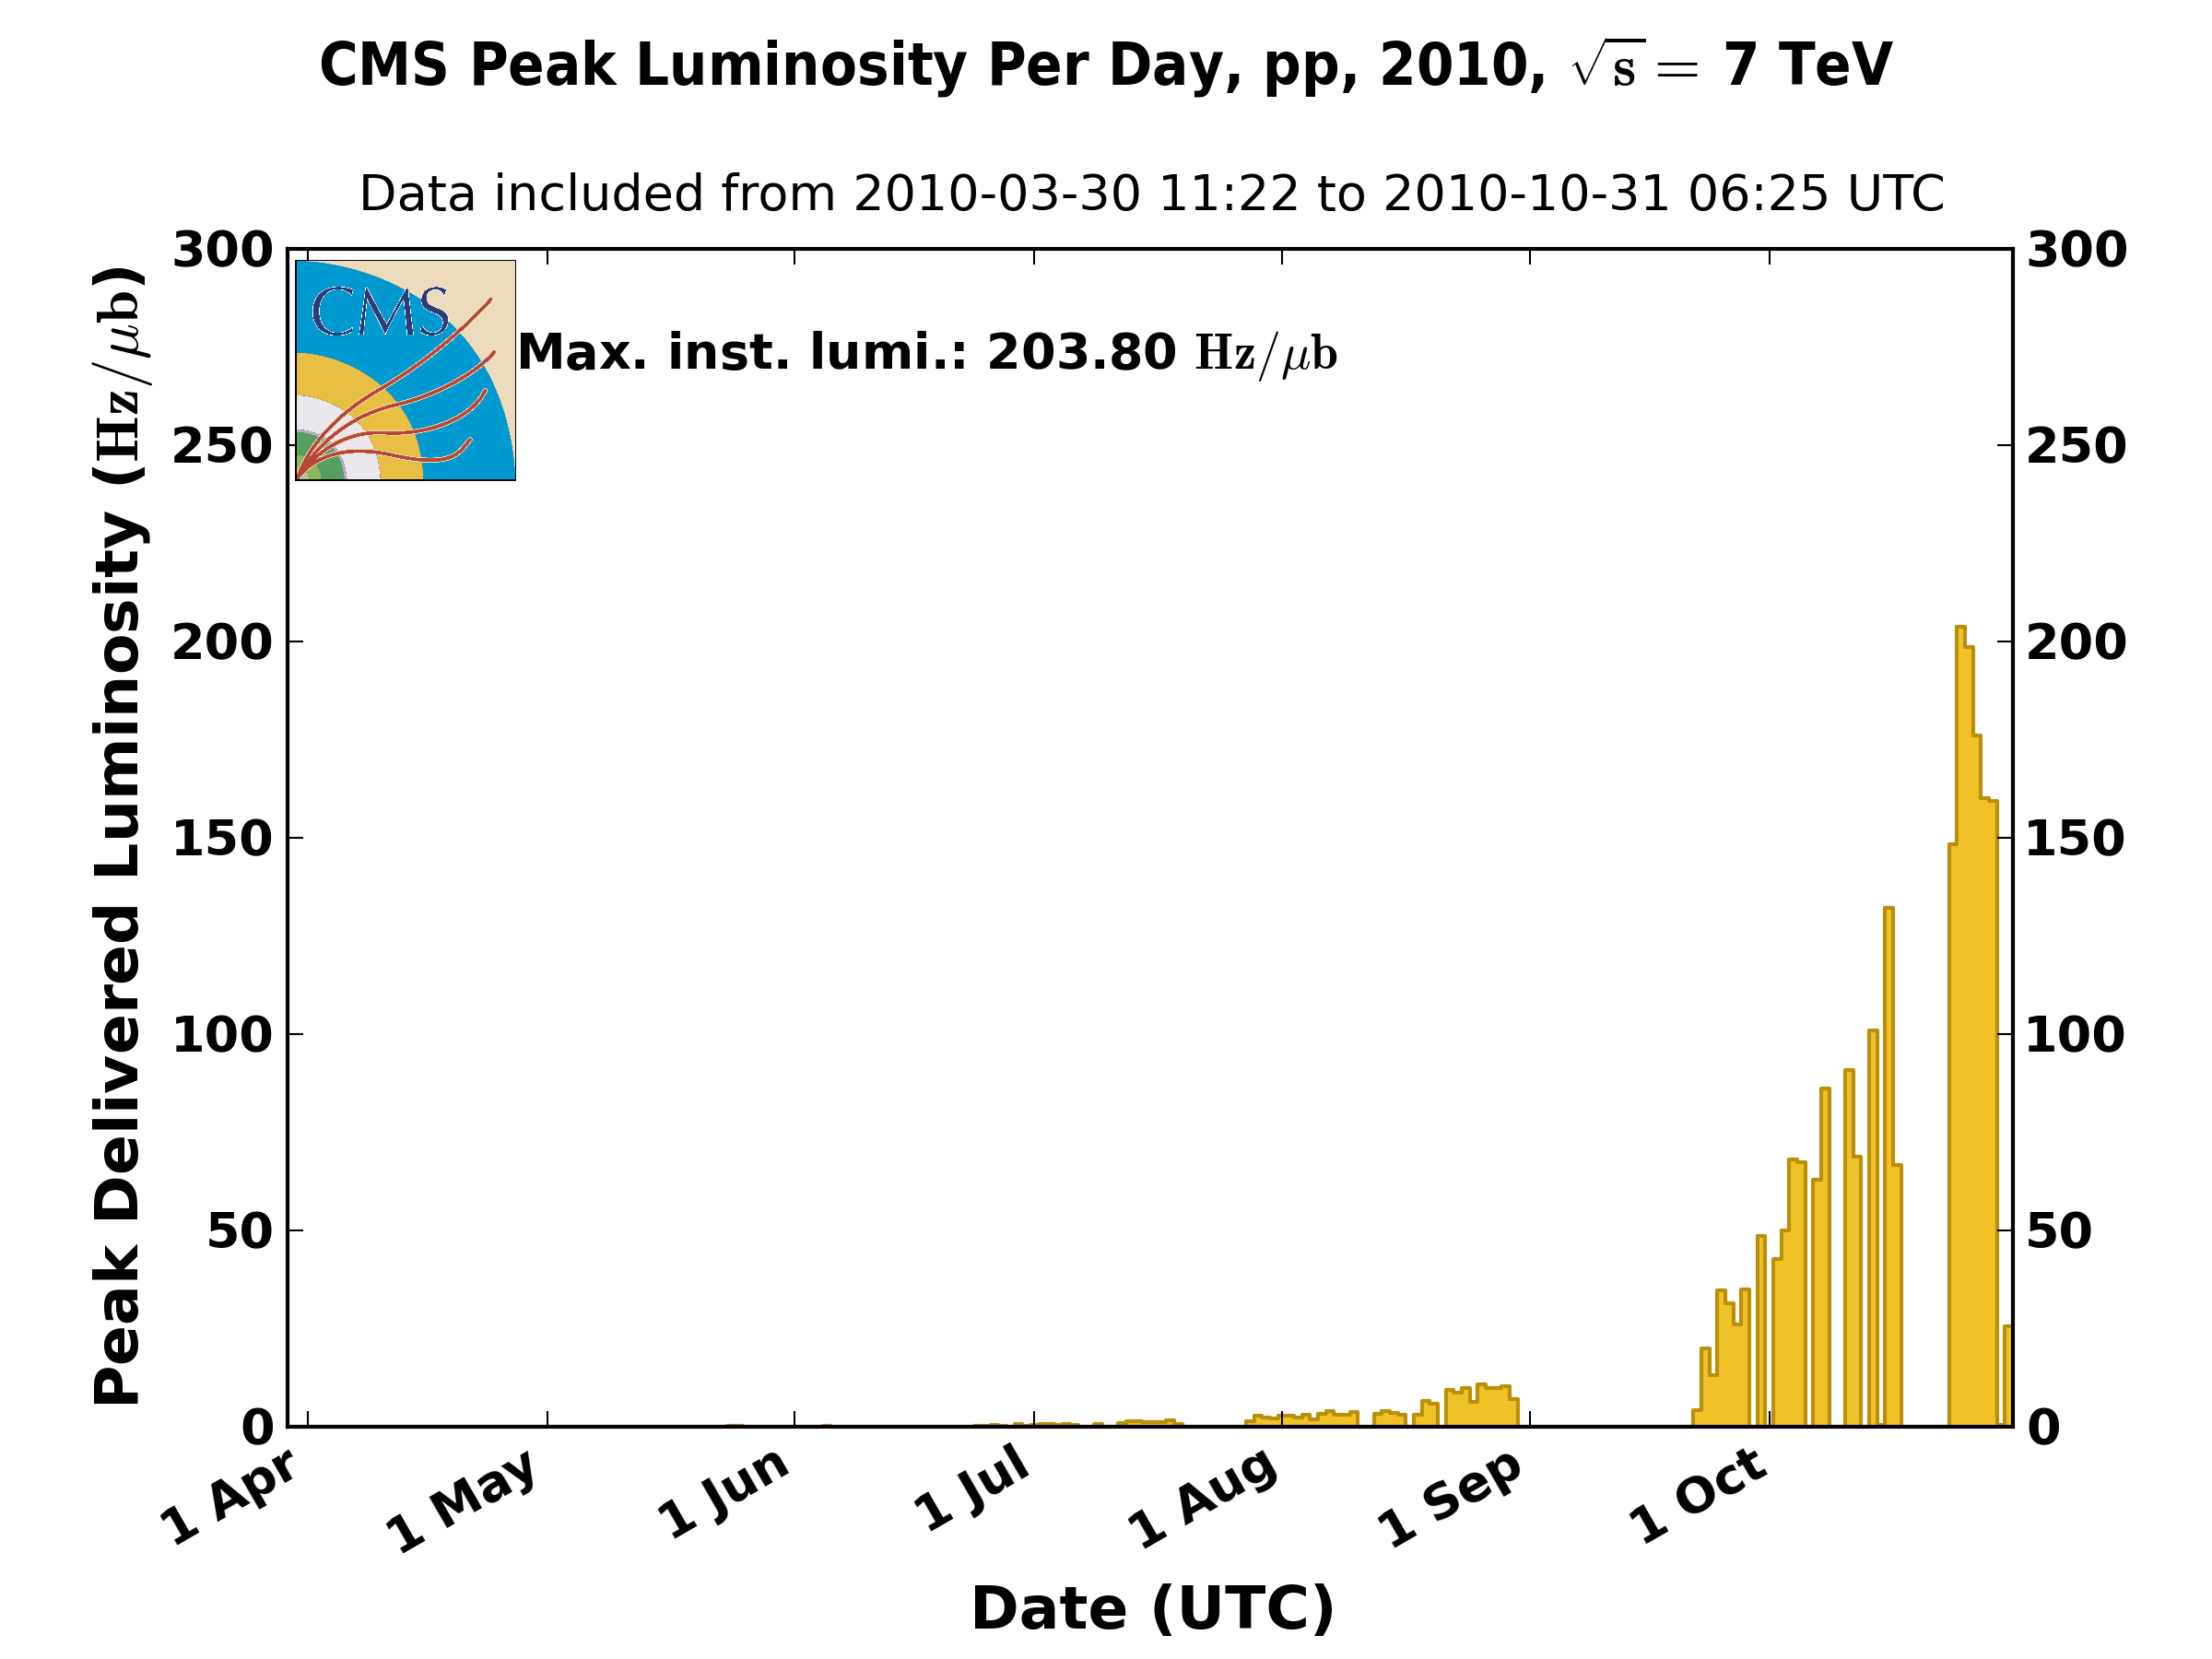 https://cern.ch/cmslumi/publicplots/peak_lumi_per_day_pp_2010.png